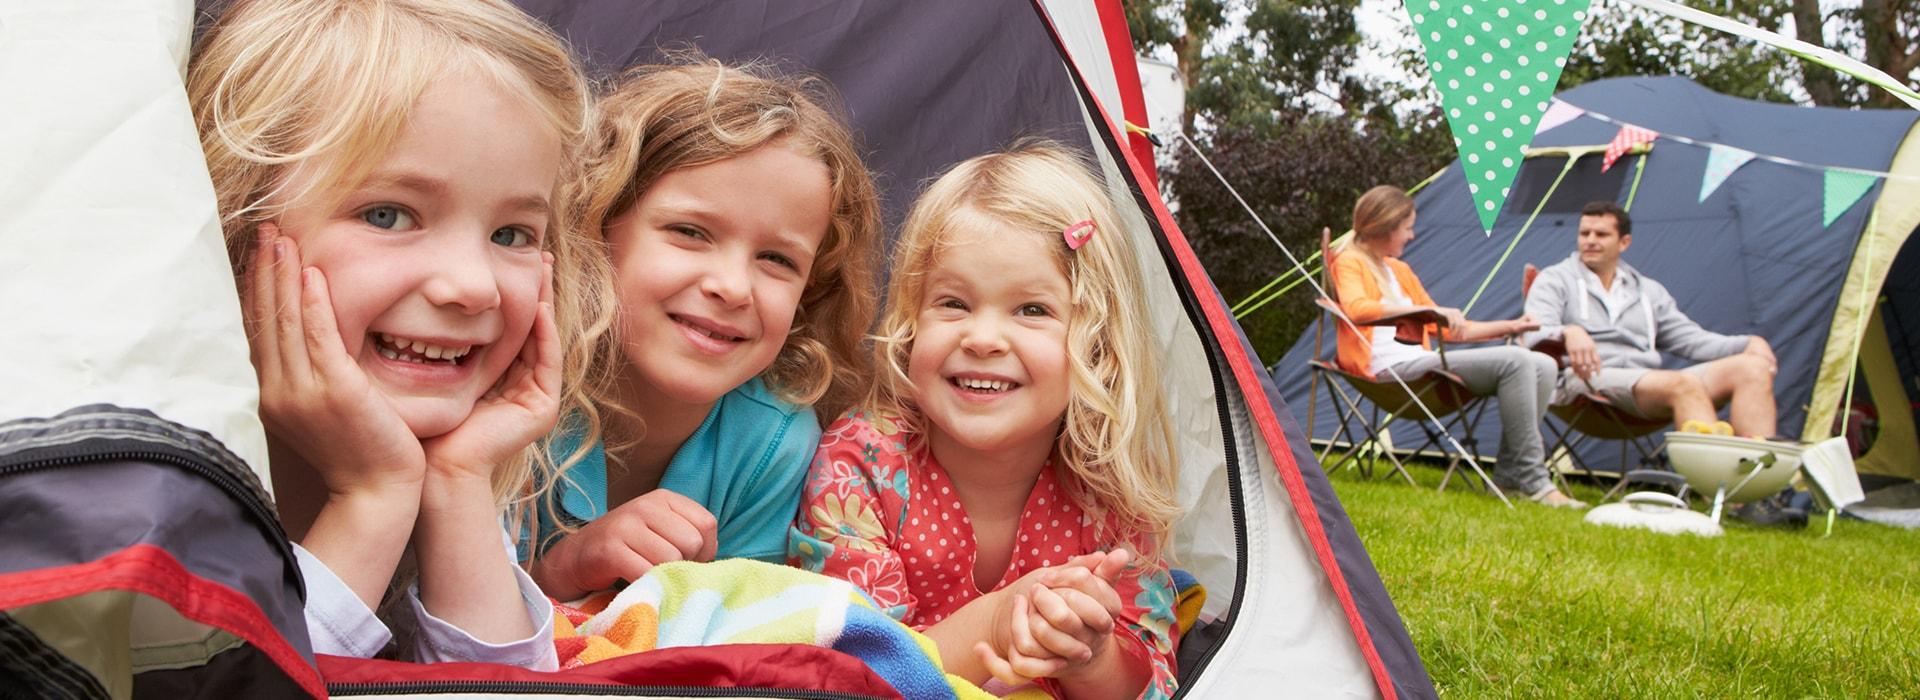 Camping en Cantabria - Somoparque